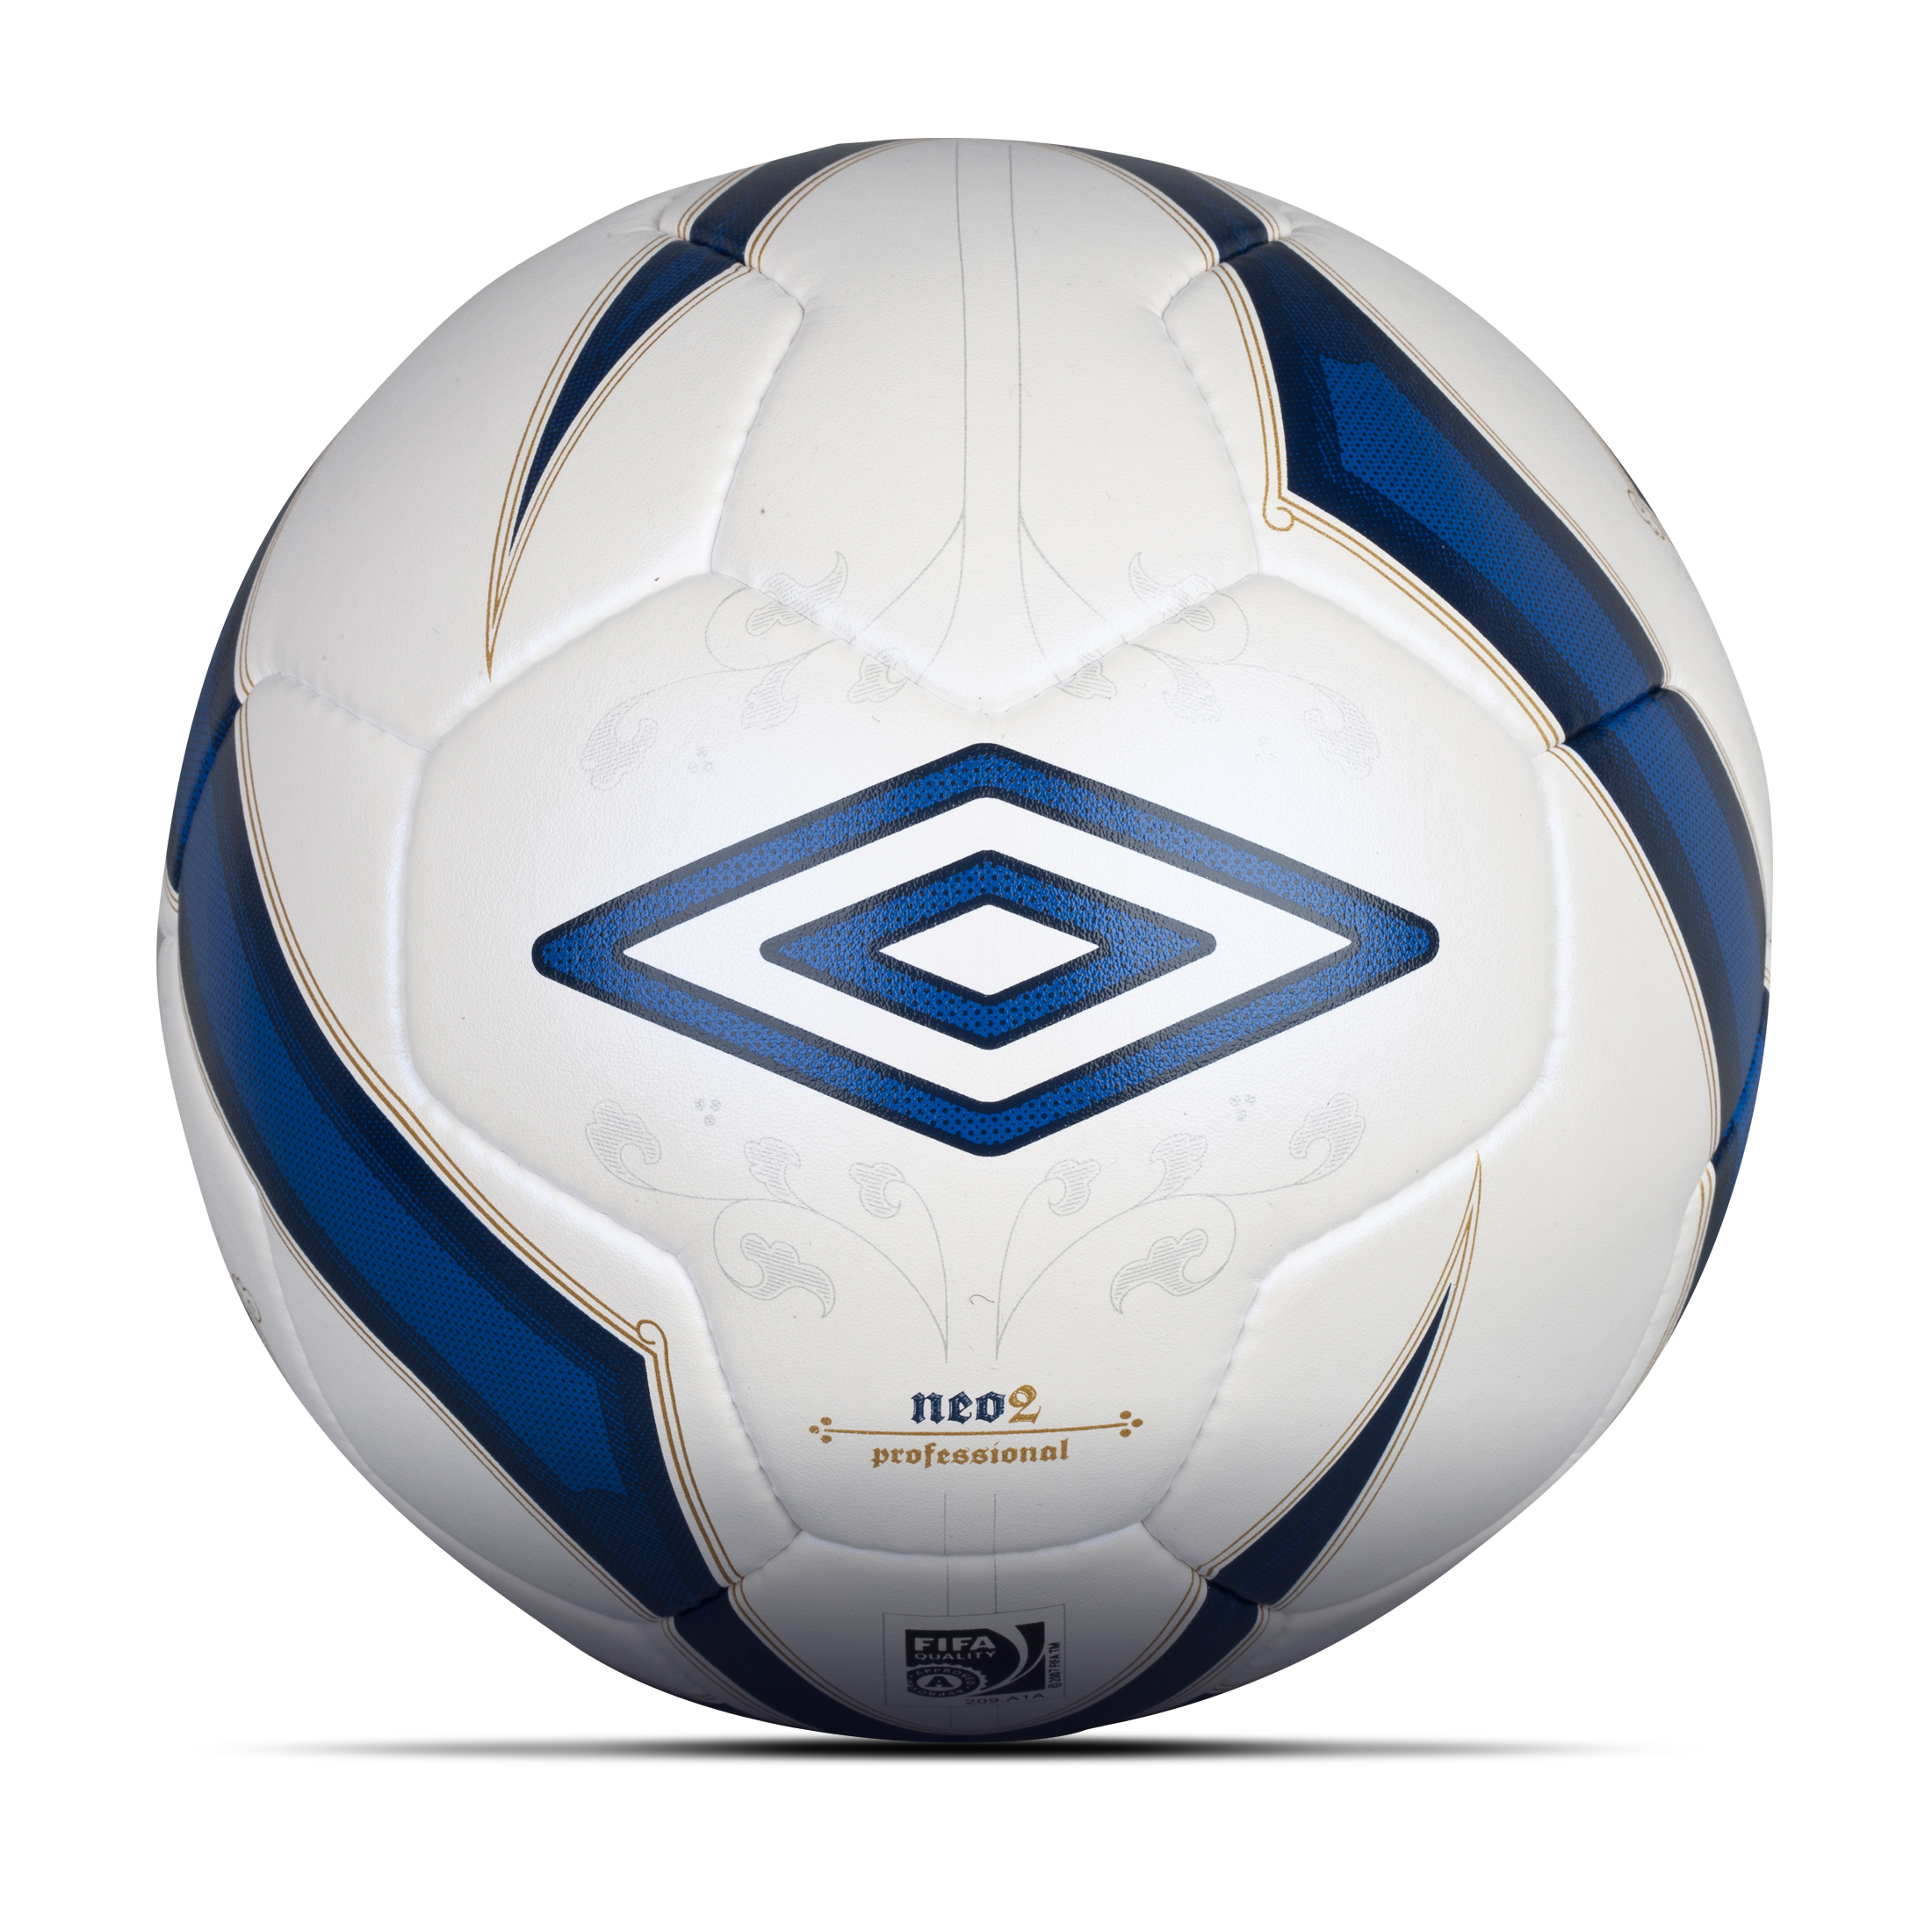 Umbro Neo 2 Pro Football-White / Twilight Blue / Gold